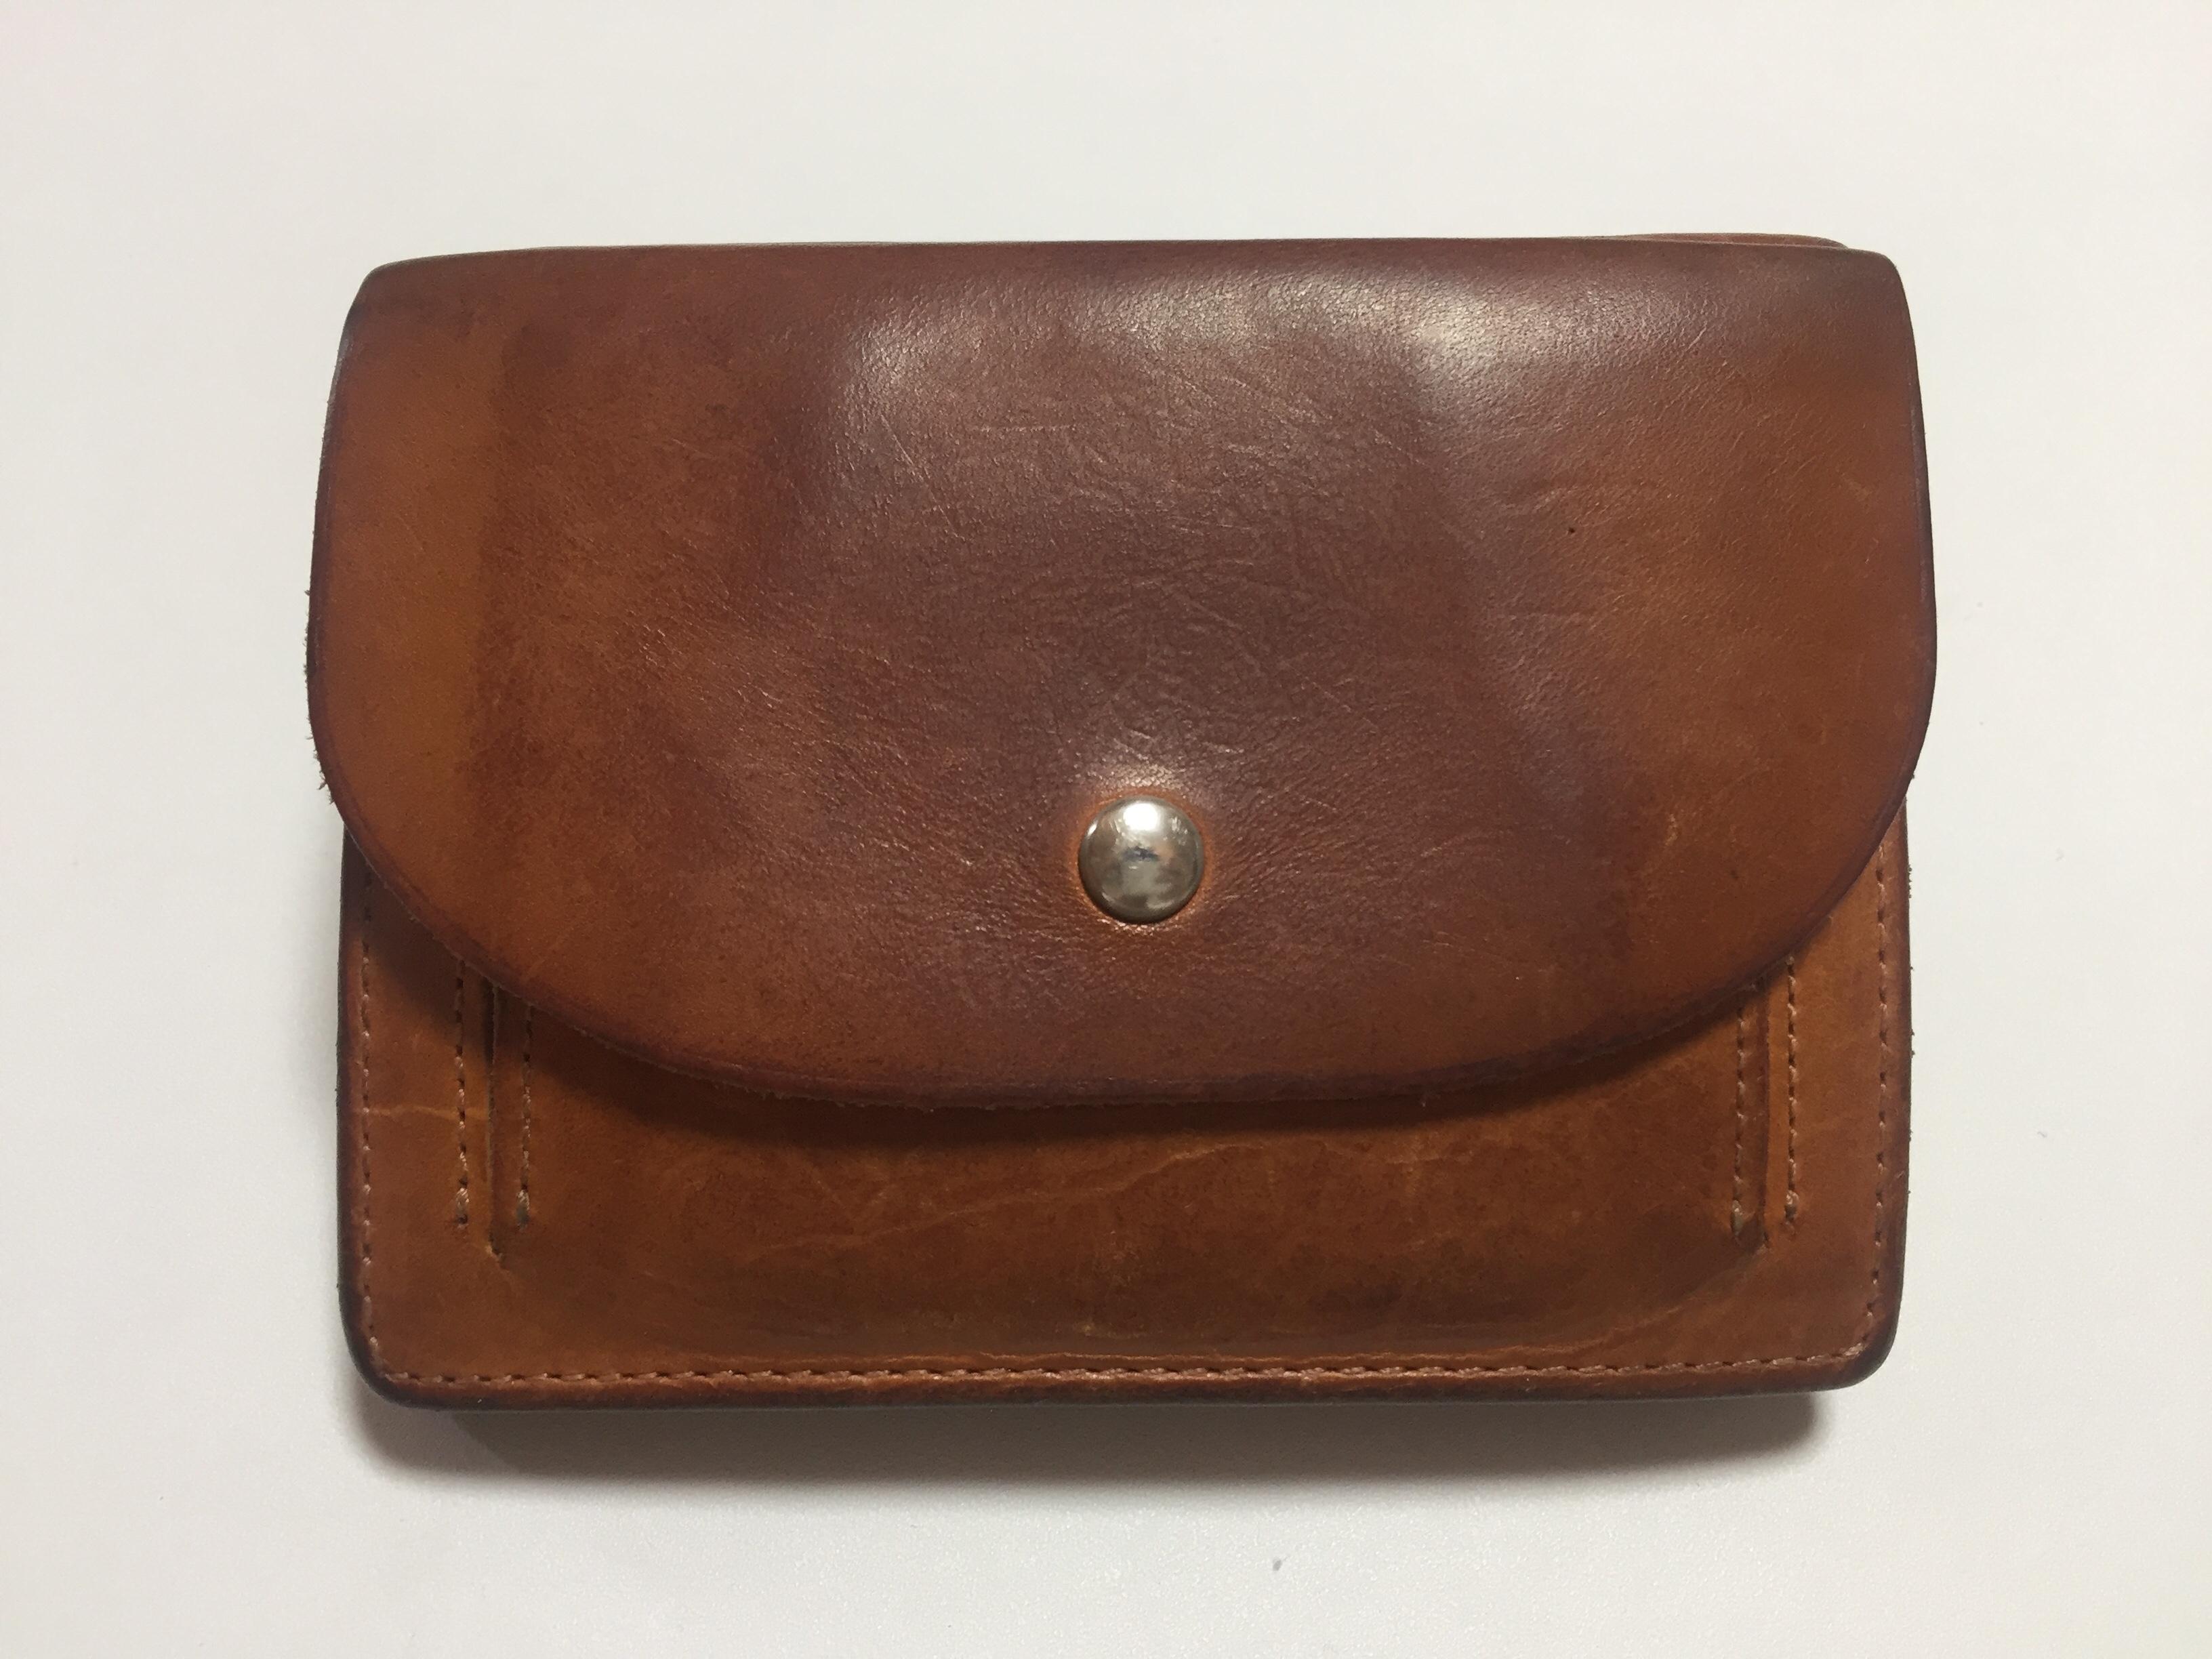 Honer gatheringの財布